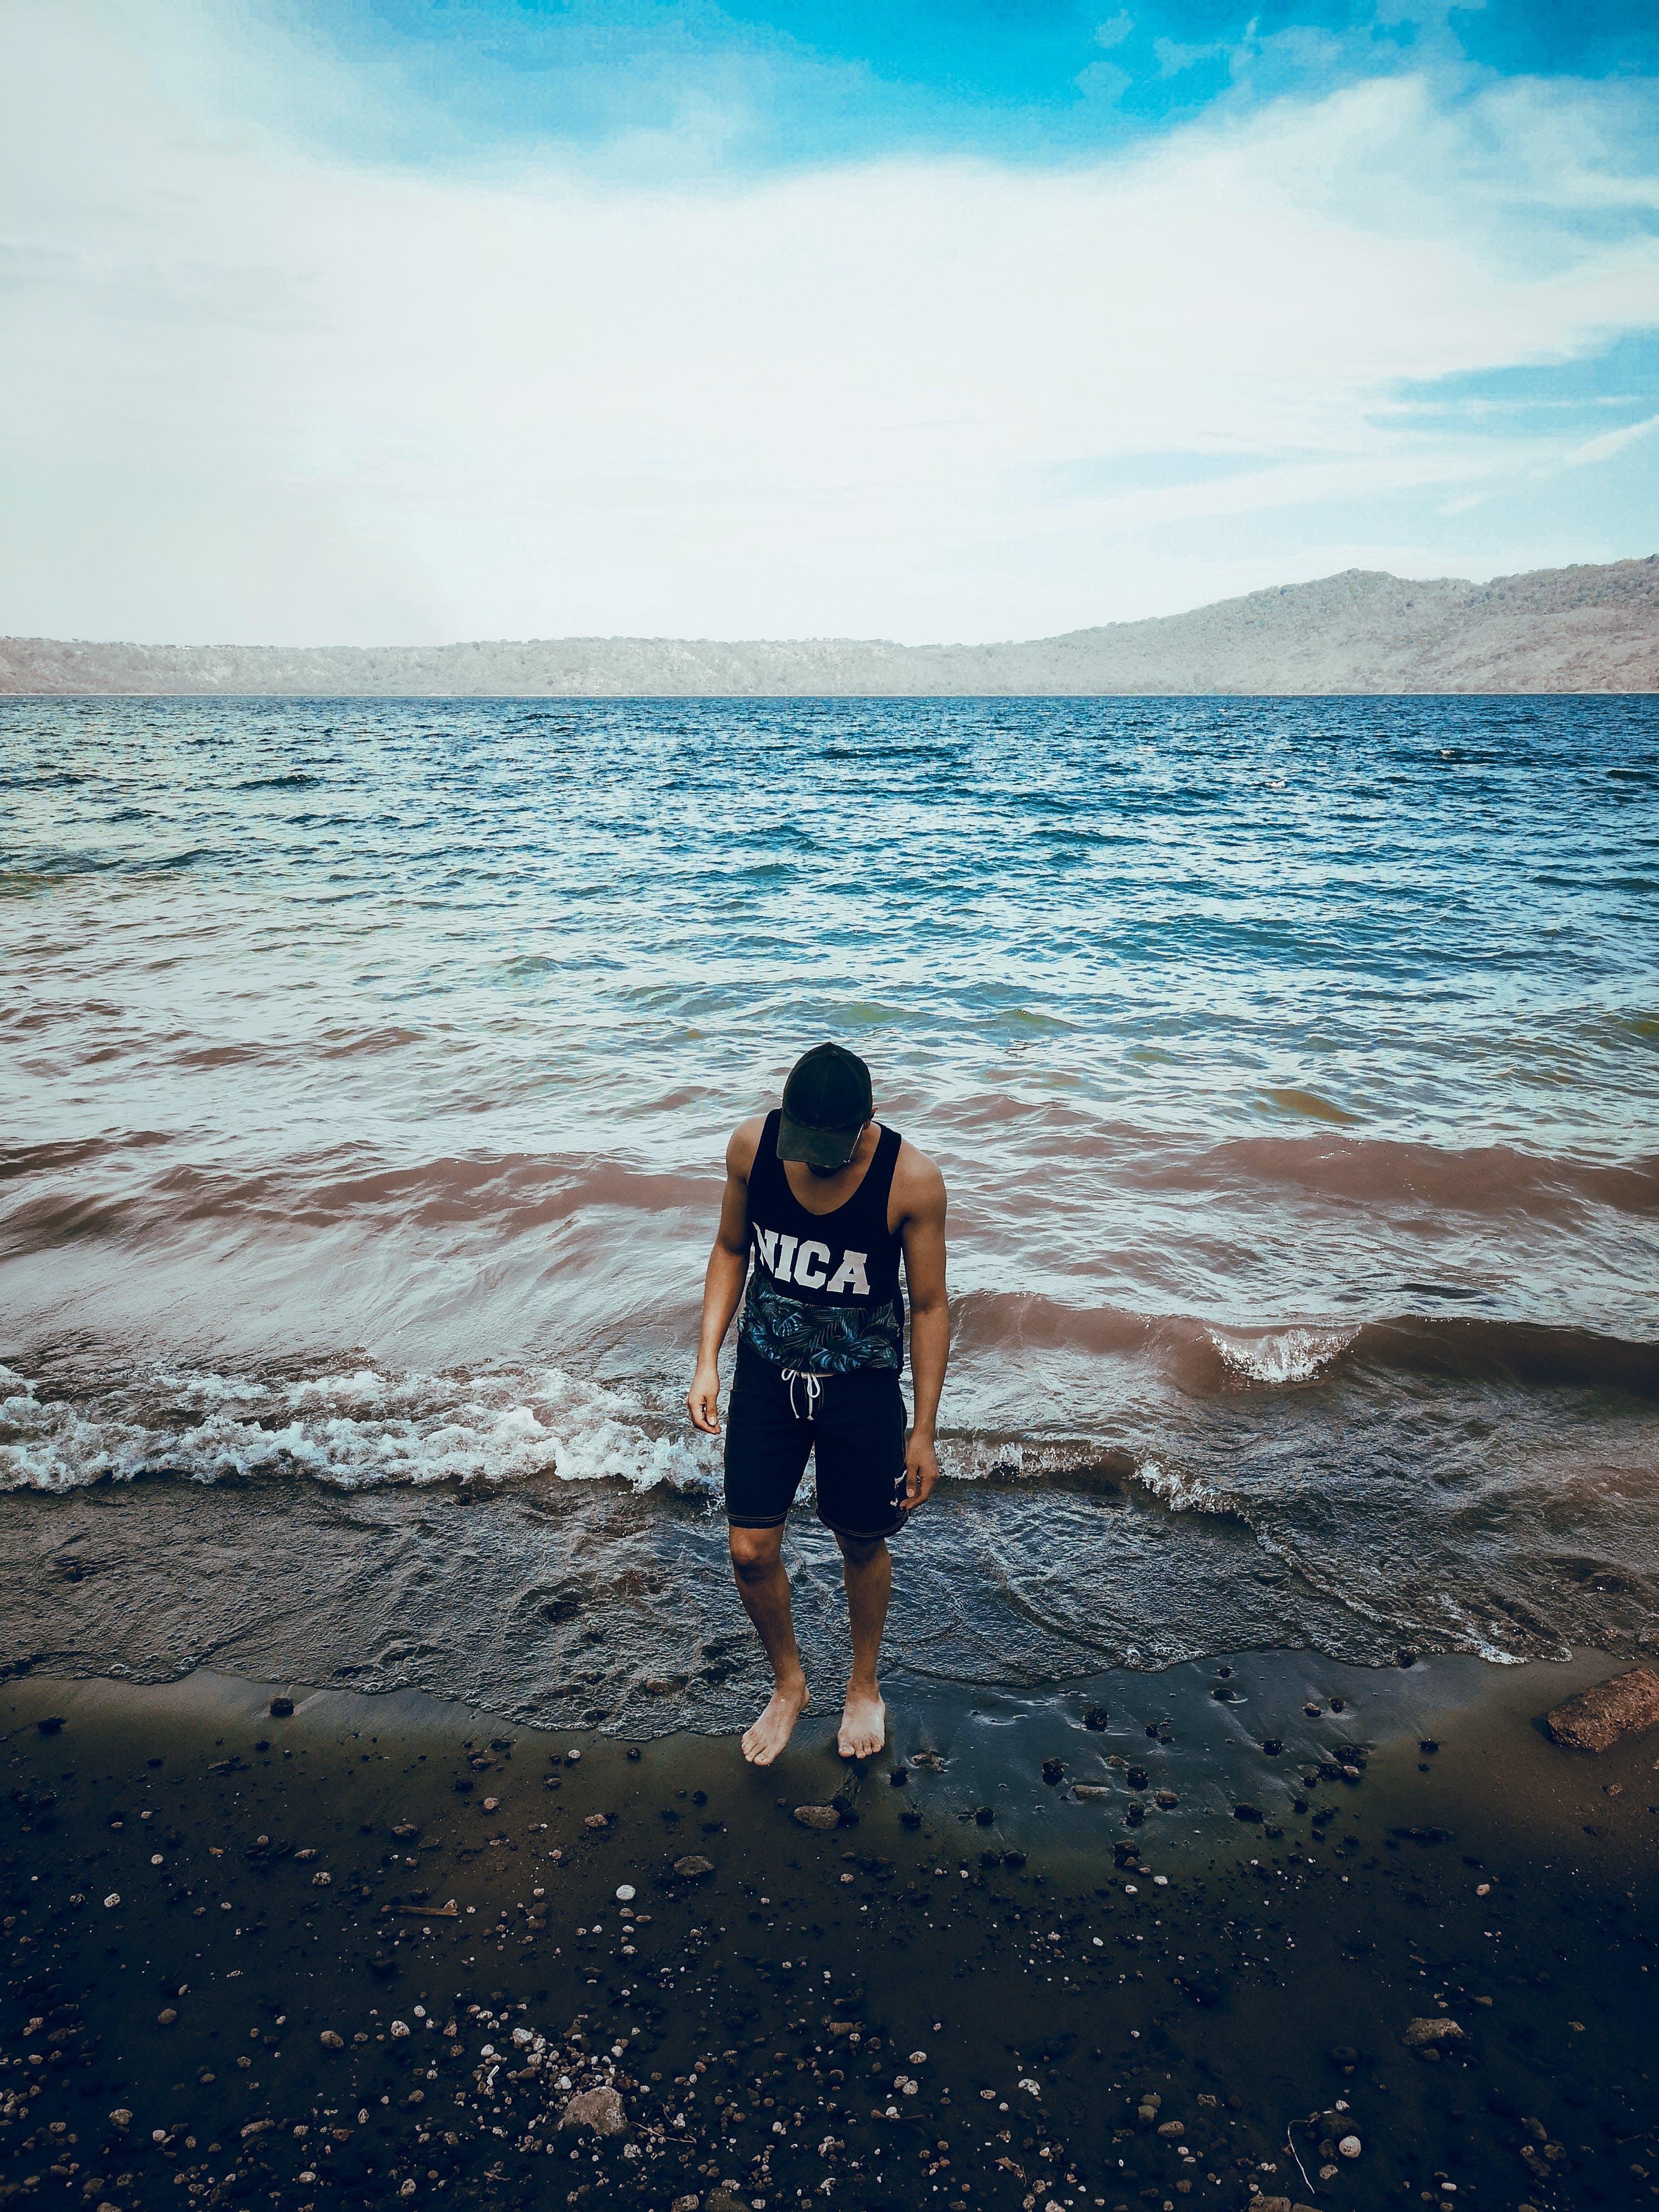 Fotos de stock gratuitas de arena, costa, hombre, litoral